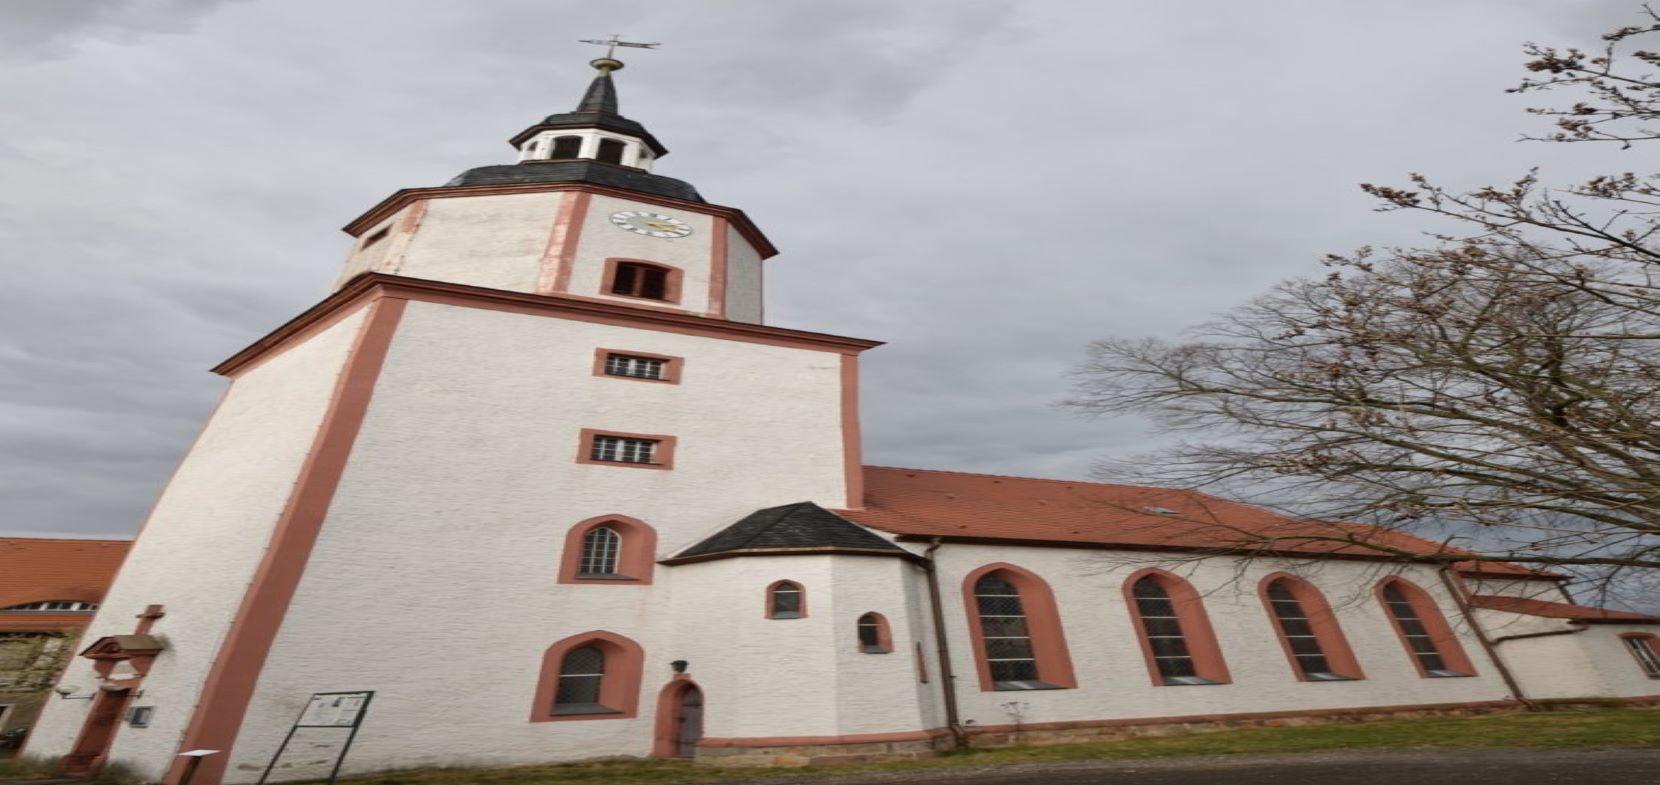 St. Laurentiuskirche Kahnsdorf